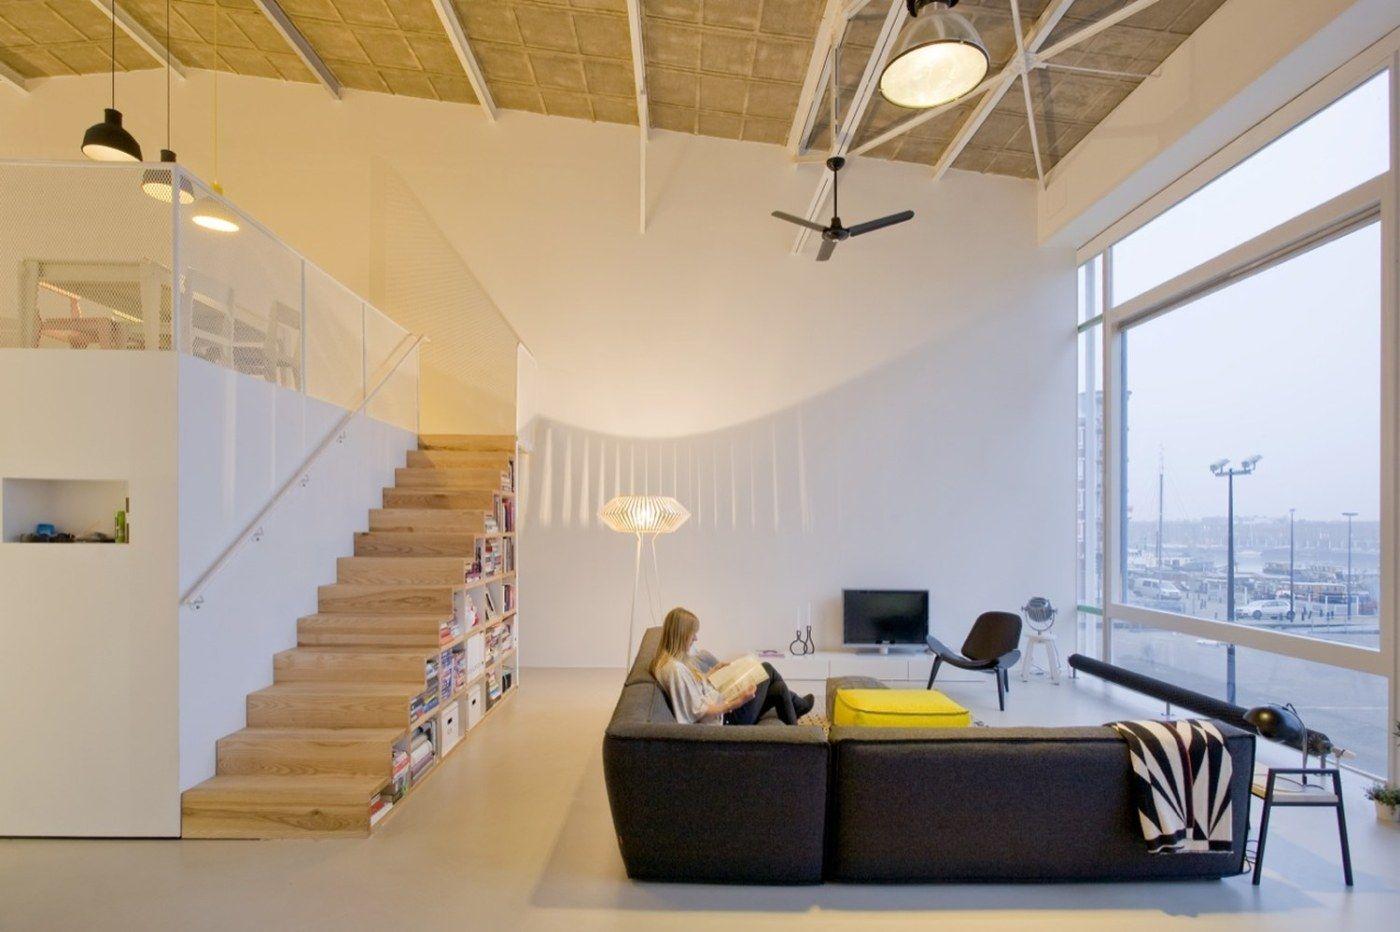 Inloopkast Knsm Loft : House like village by marc koehler architects pinterest